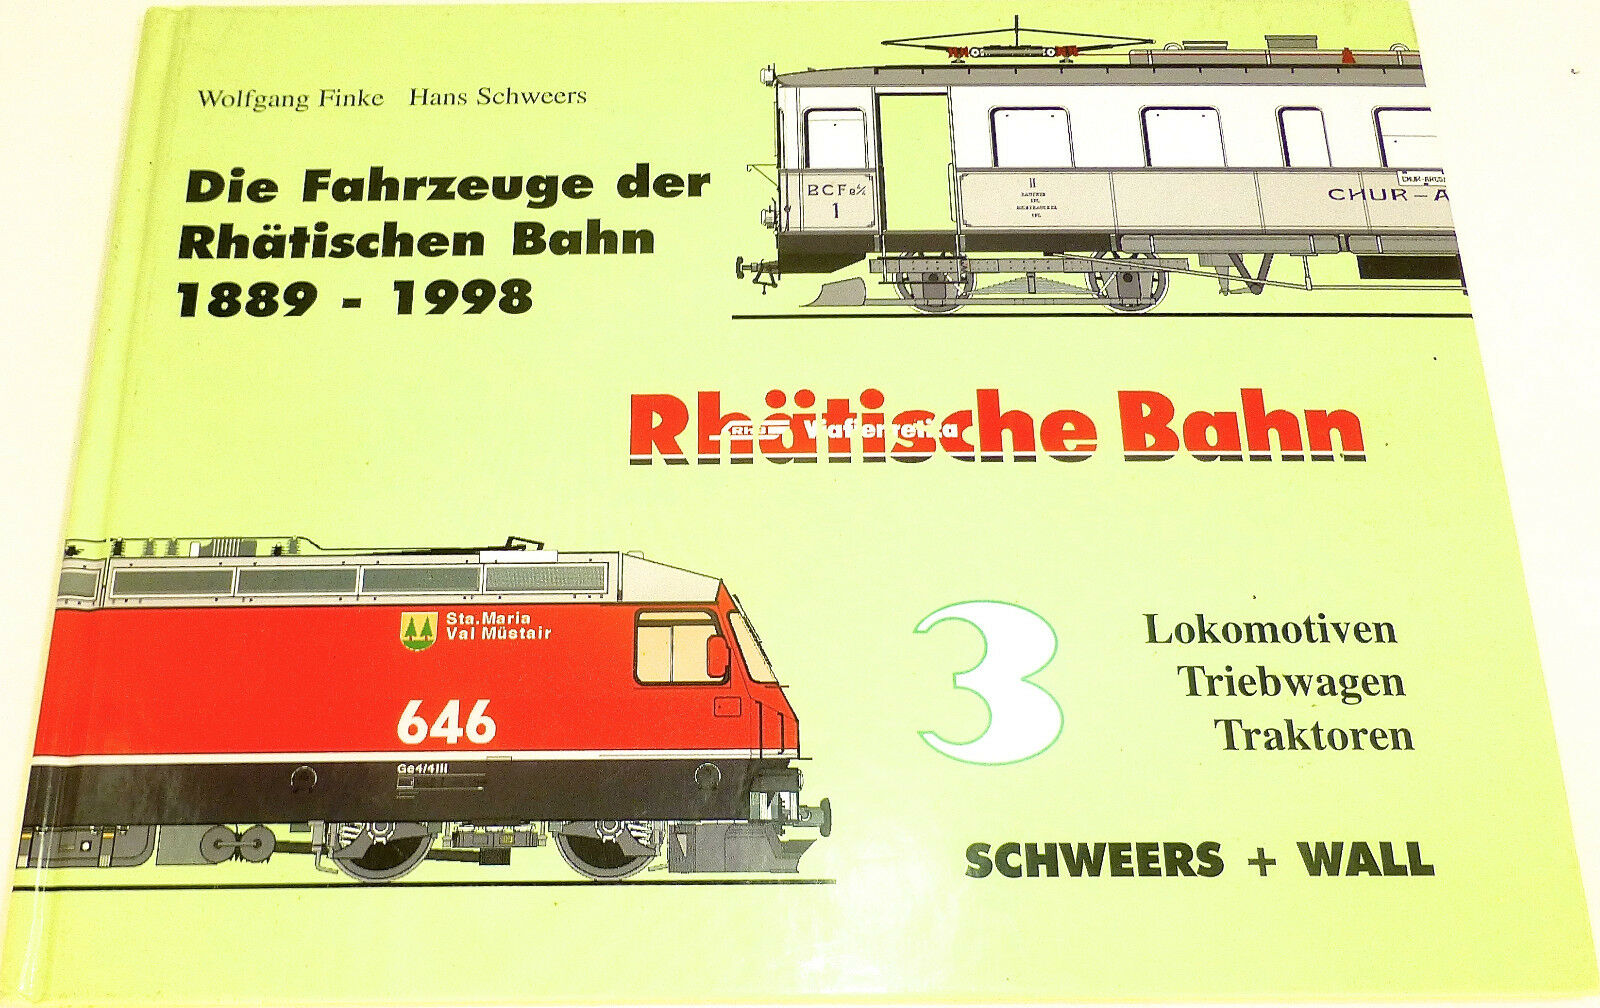 Veicoli rhätischen ferroviario 1889-1998 locomotive trainante carrello Schweers Wall hc4 Å